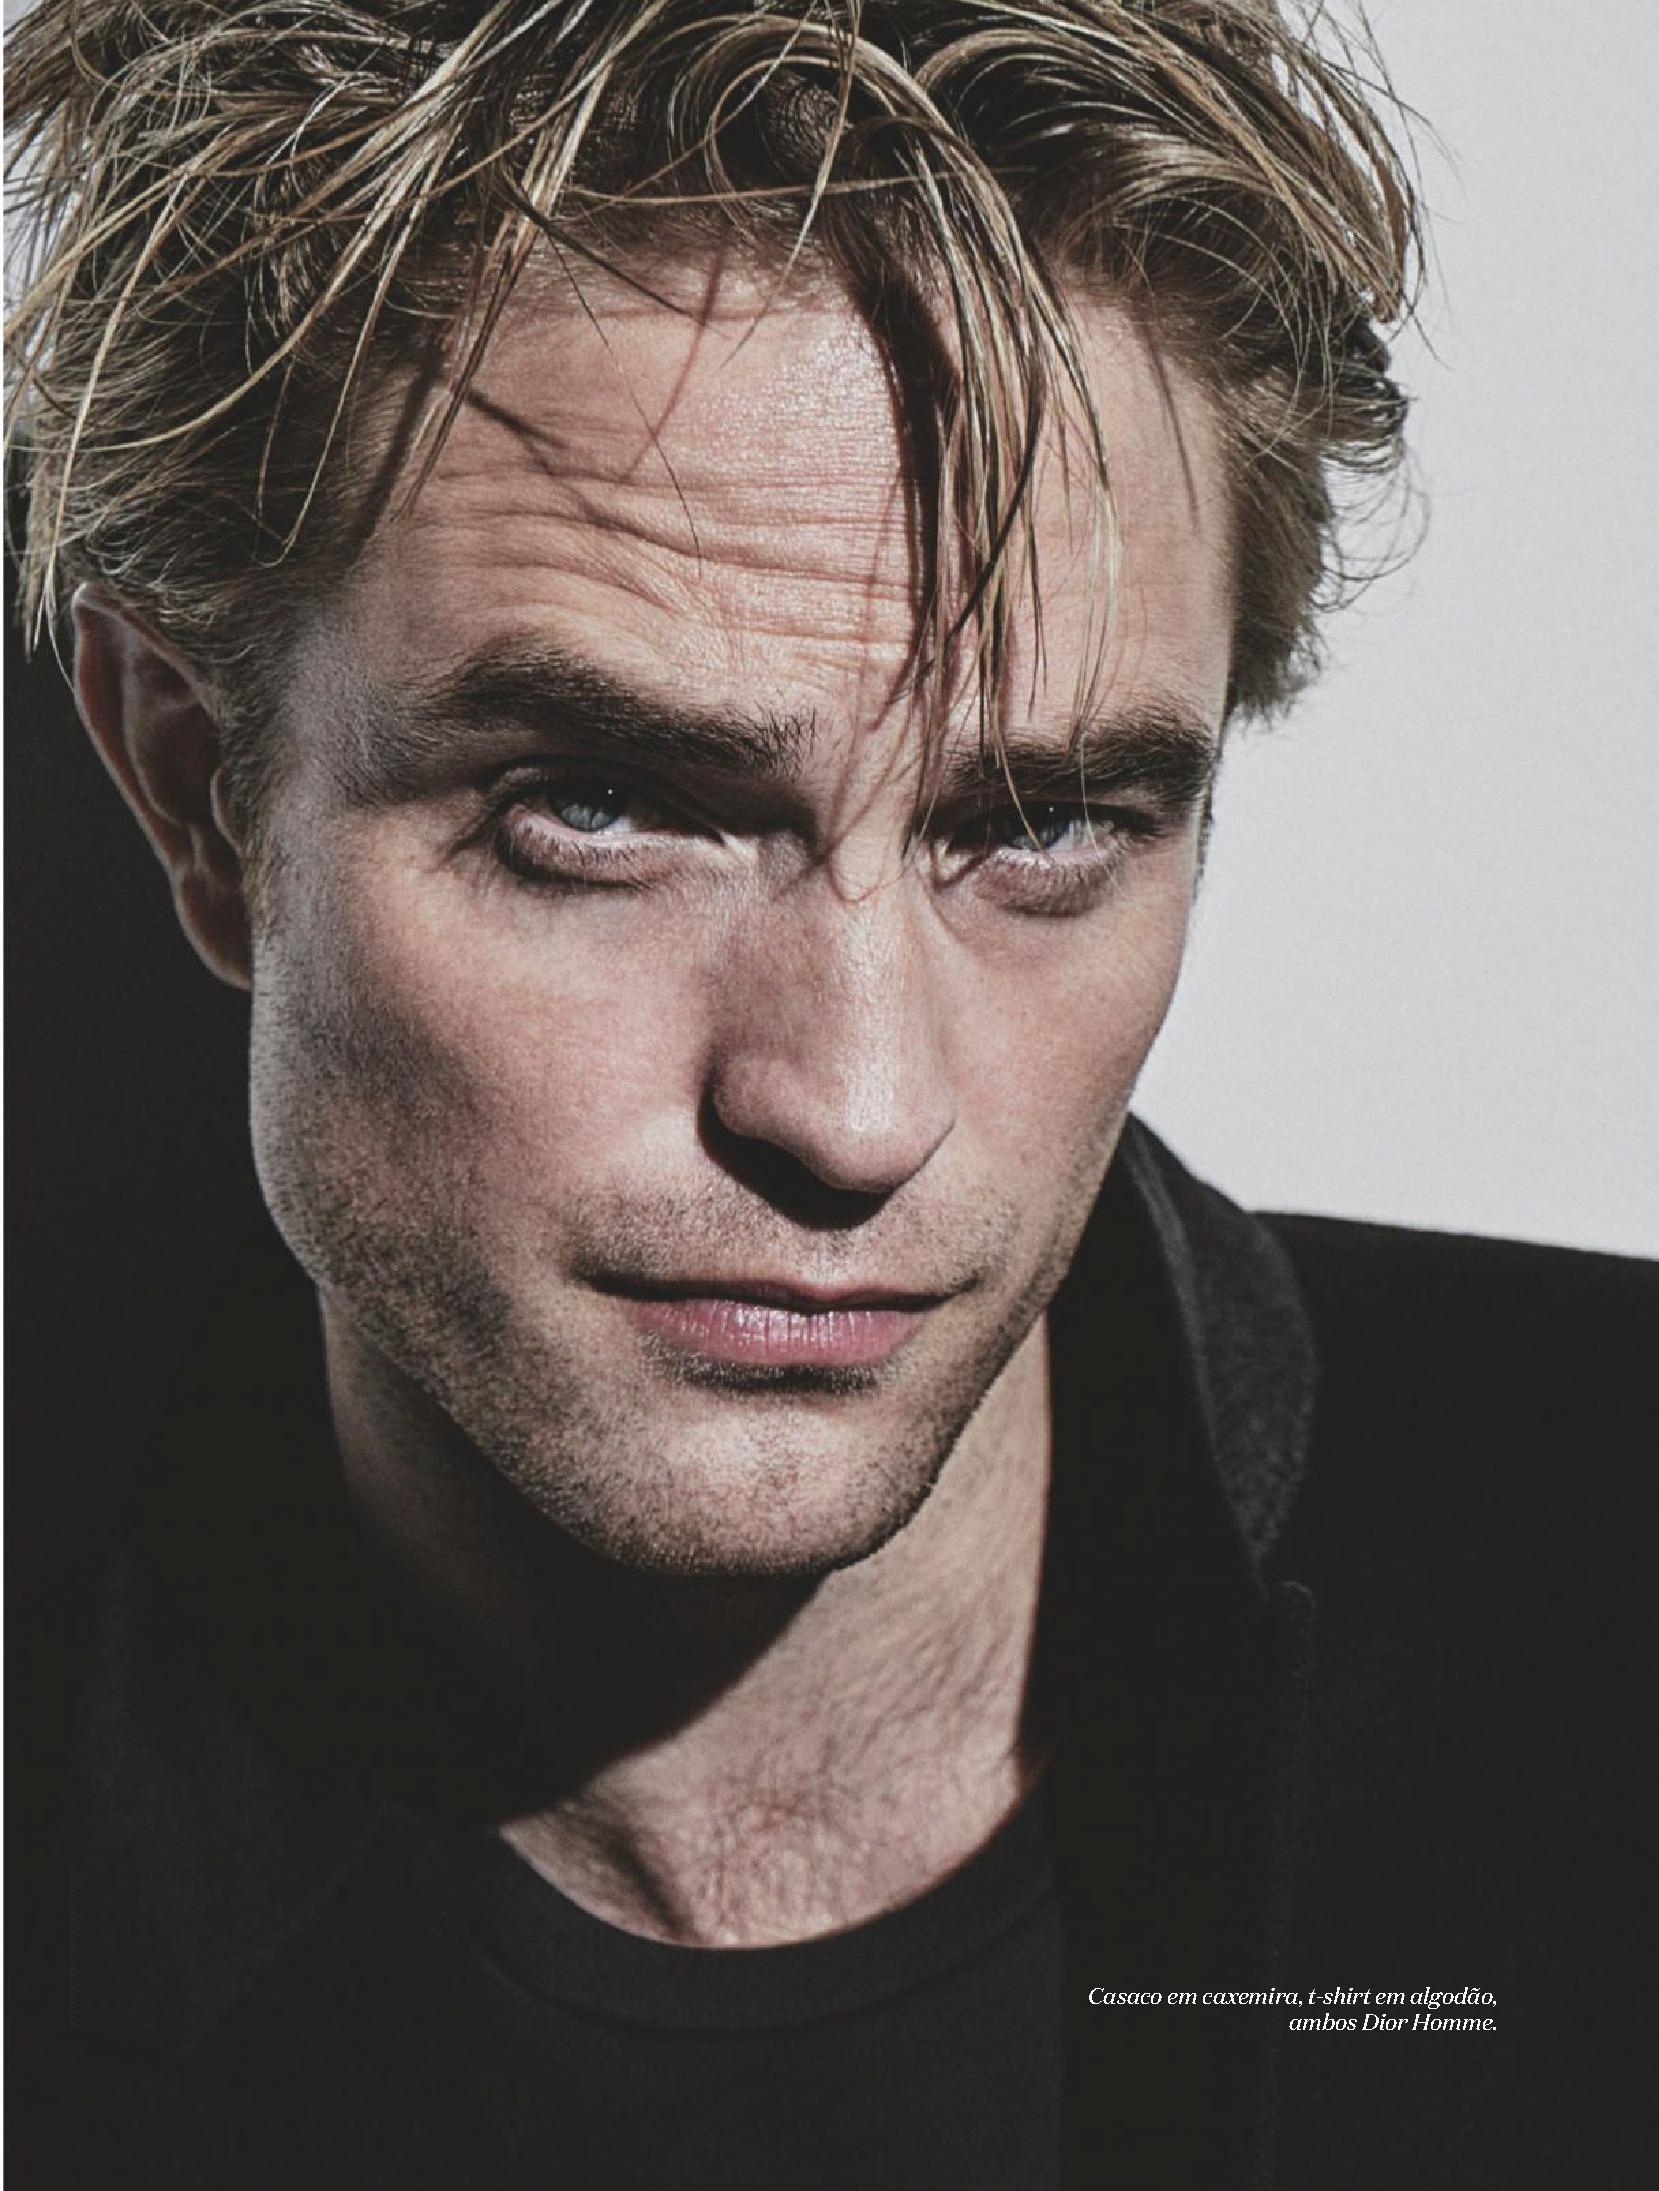 The Batman Star Robert Pattinson Gets COVID-19 in London